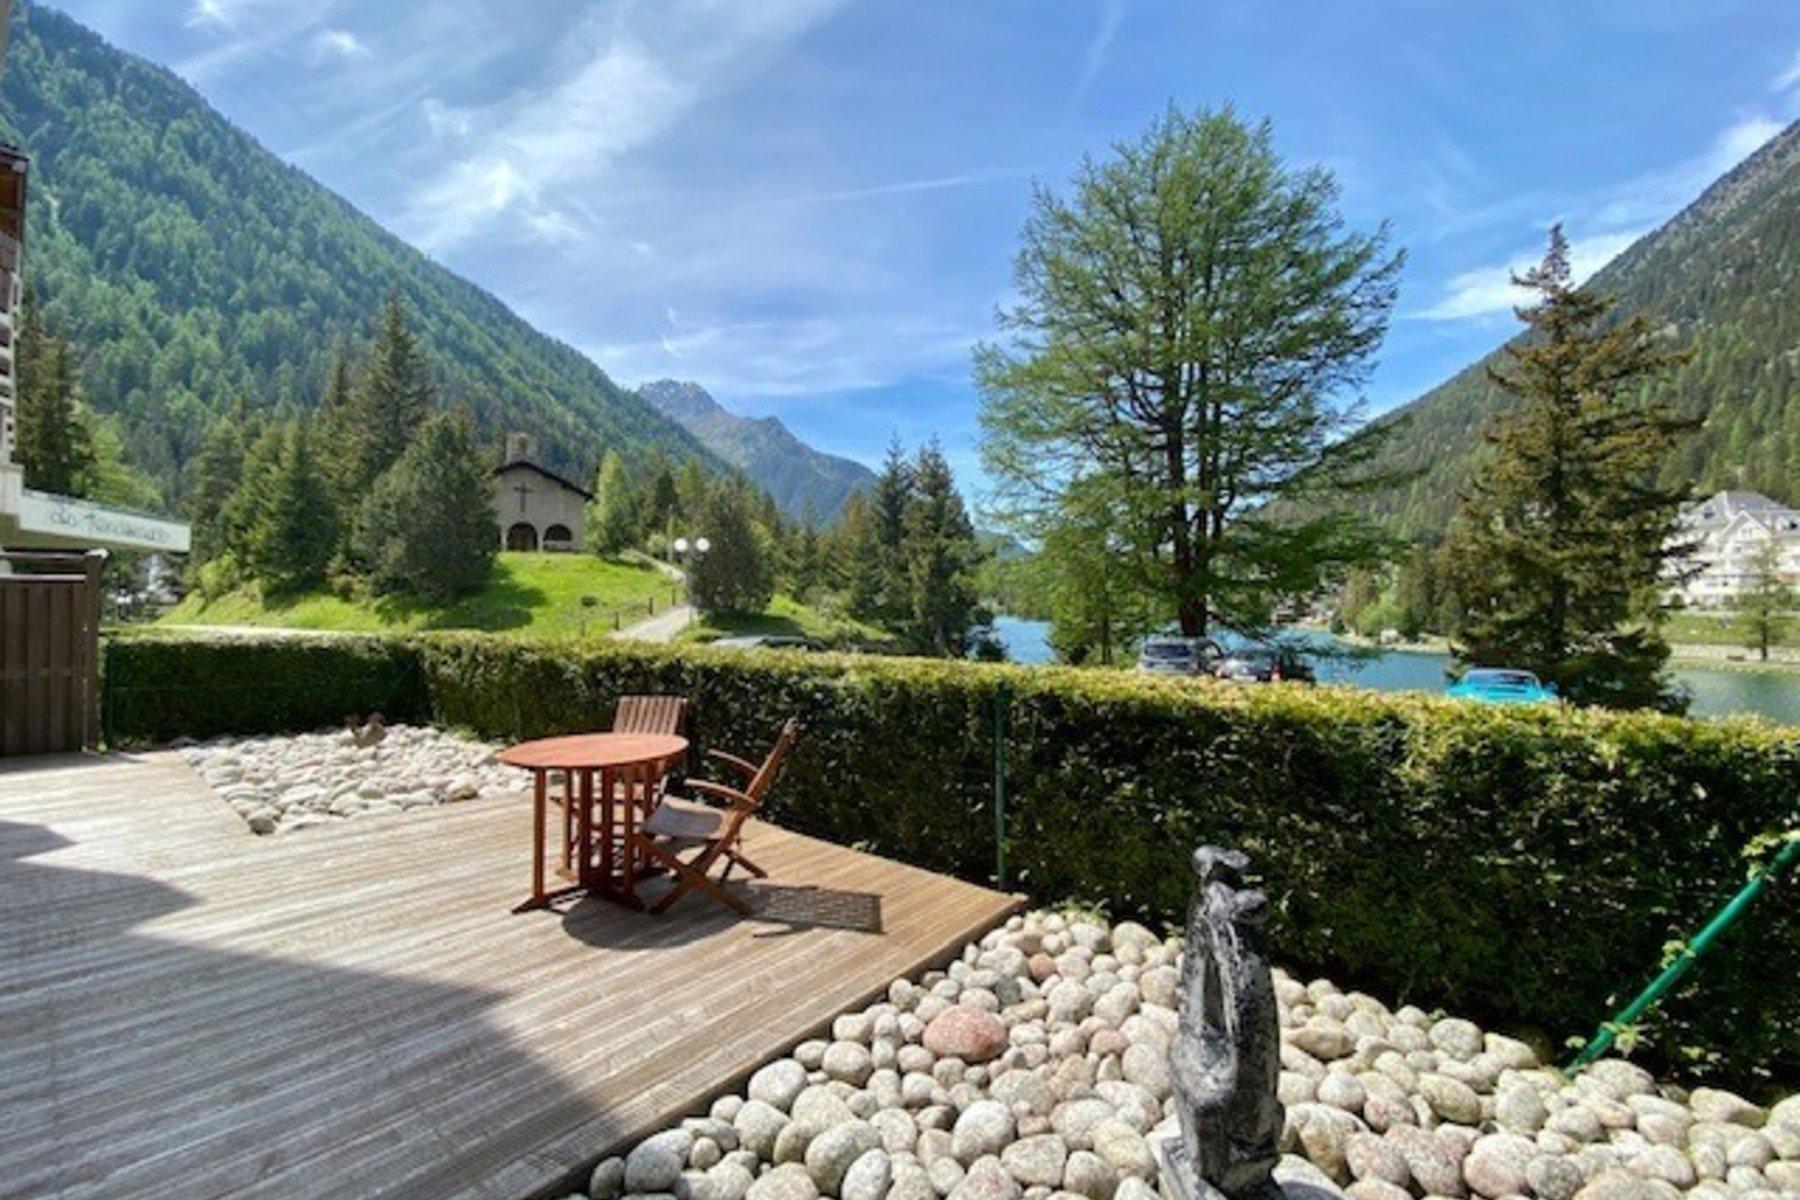 Condo in Orsières, Valais, Switzerland 1